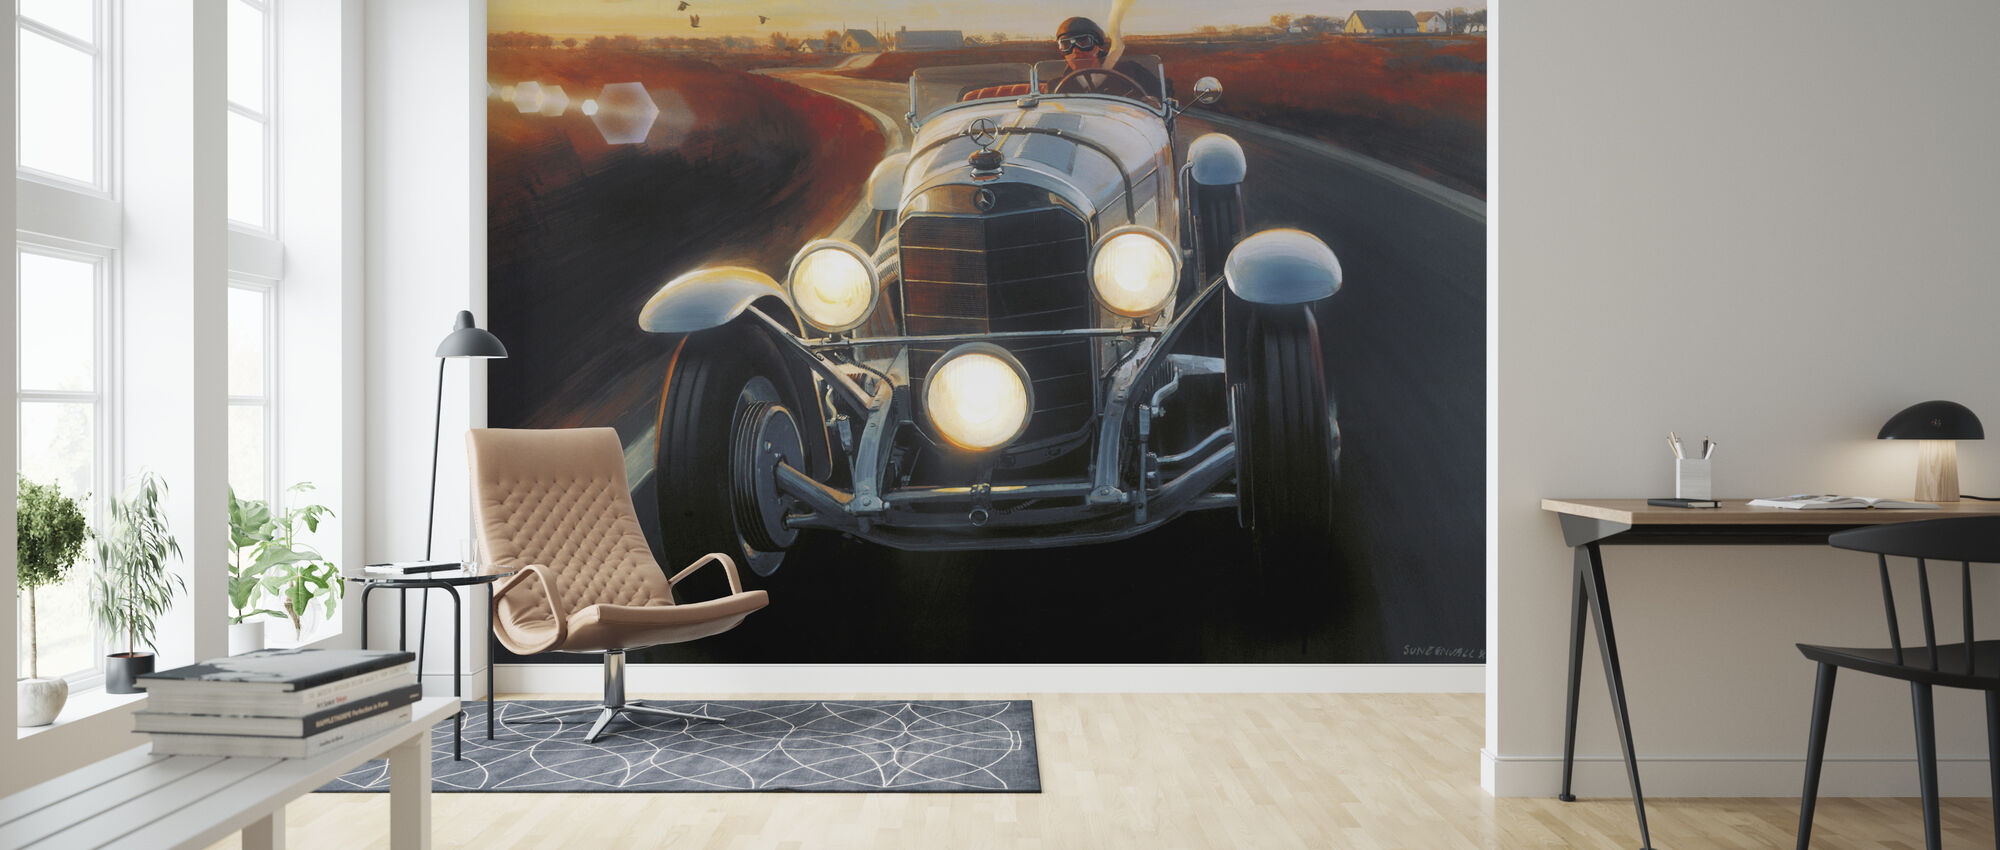 SSK - Wallpaper - Living Room